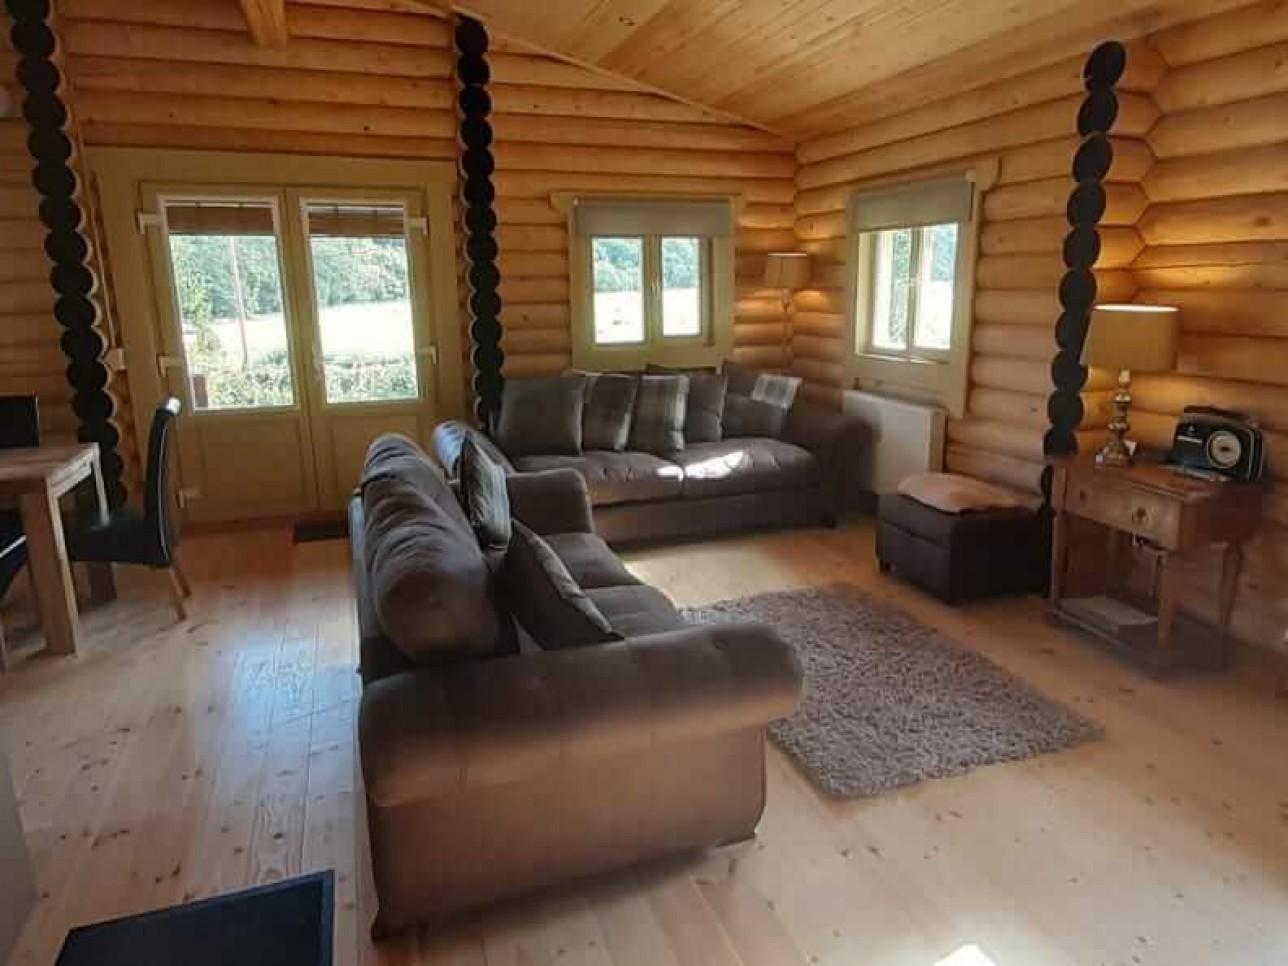 Coria Lodge At Vindomora Country Lodges